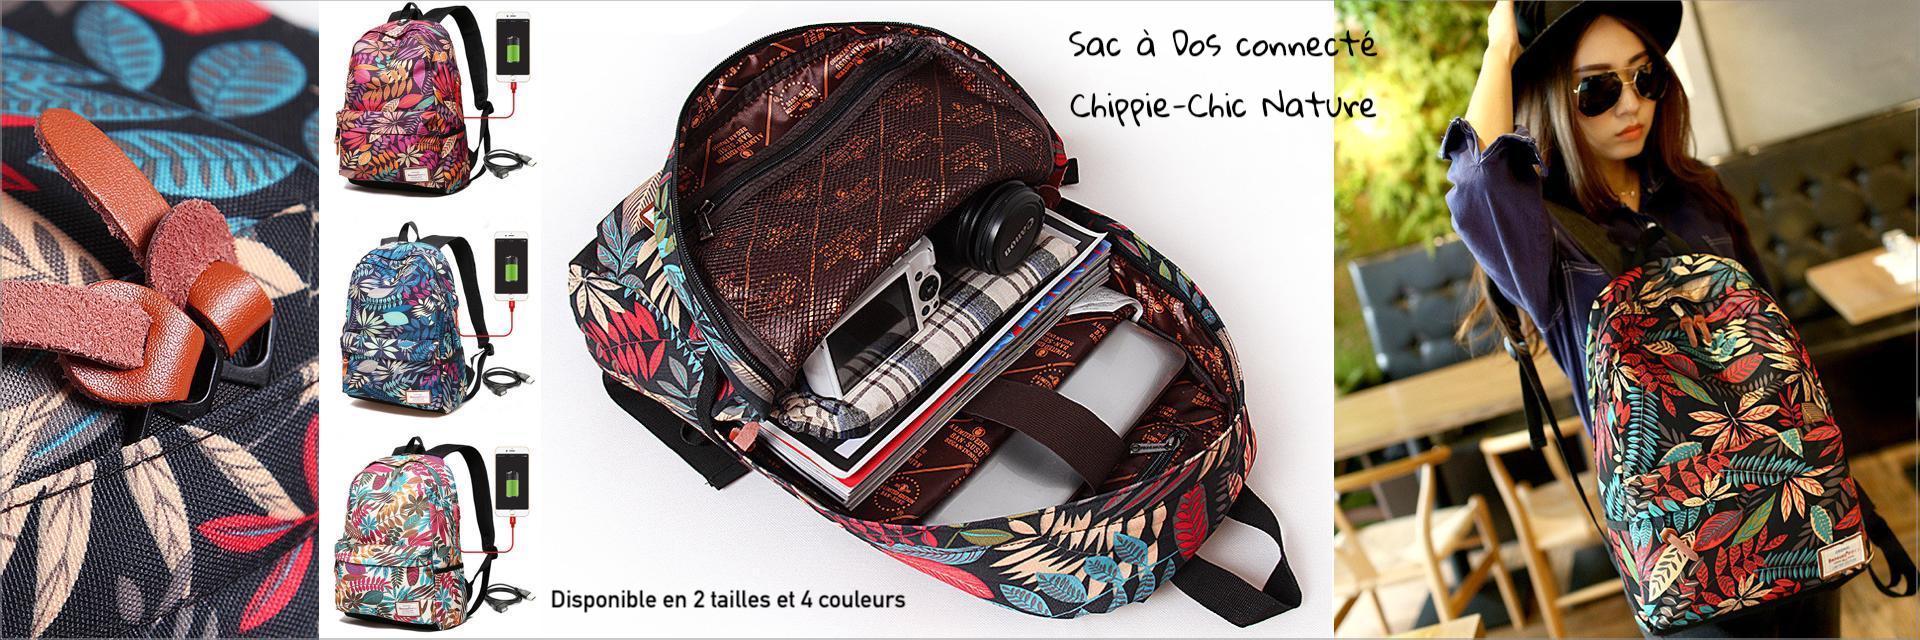 sac dos connect chippie chic hippie l 39 actu. Black Bedroom Furniture Sets. Home Design Ideas